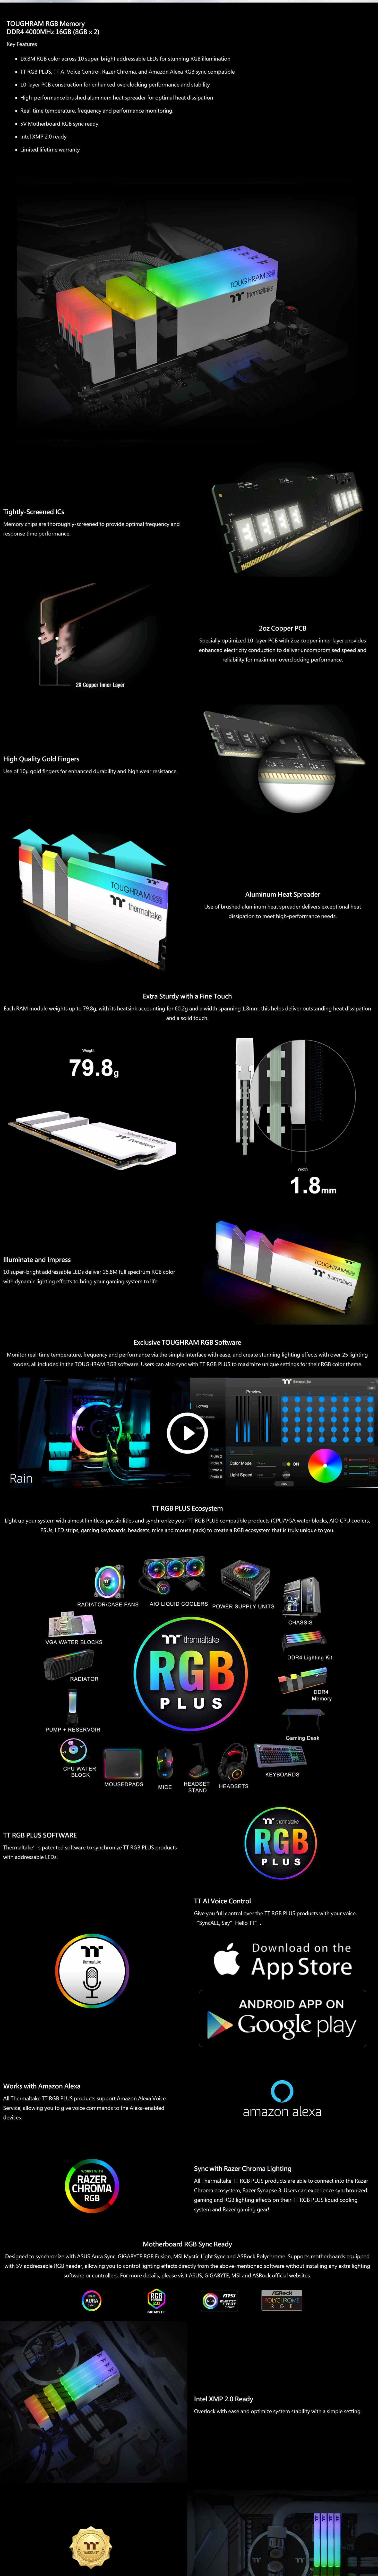 screencapture-ttpremium-product-r022d408gx2-4000c19a-2020-04-30-10_48_53.jpg